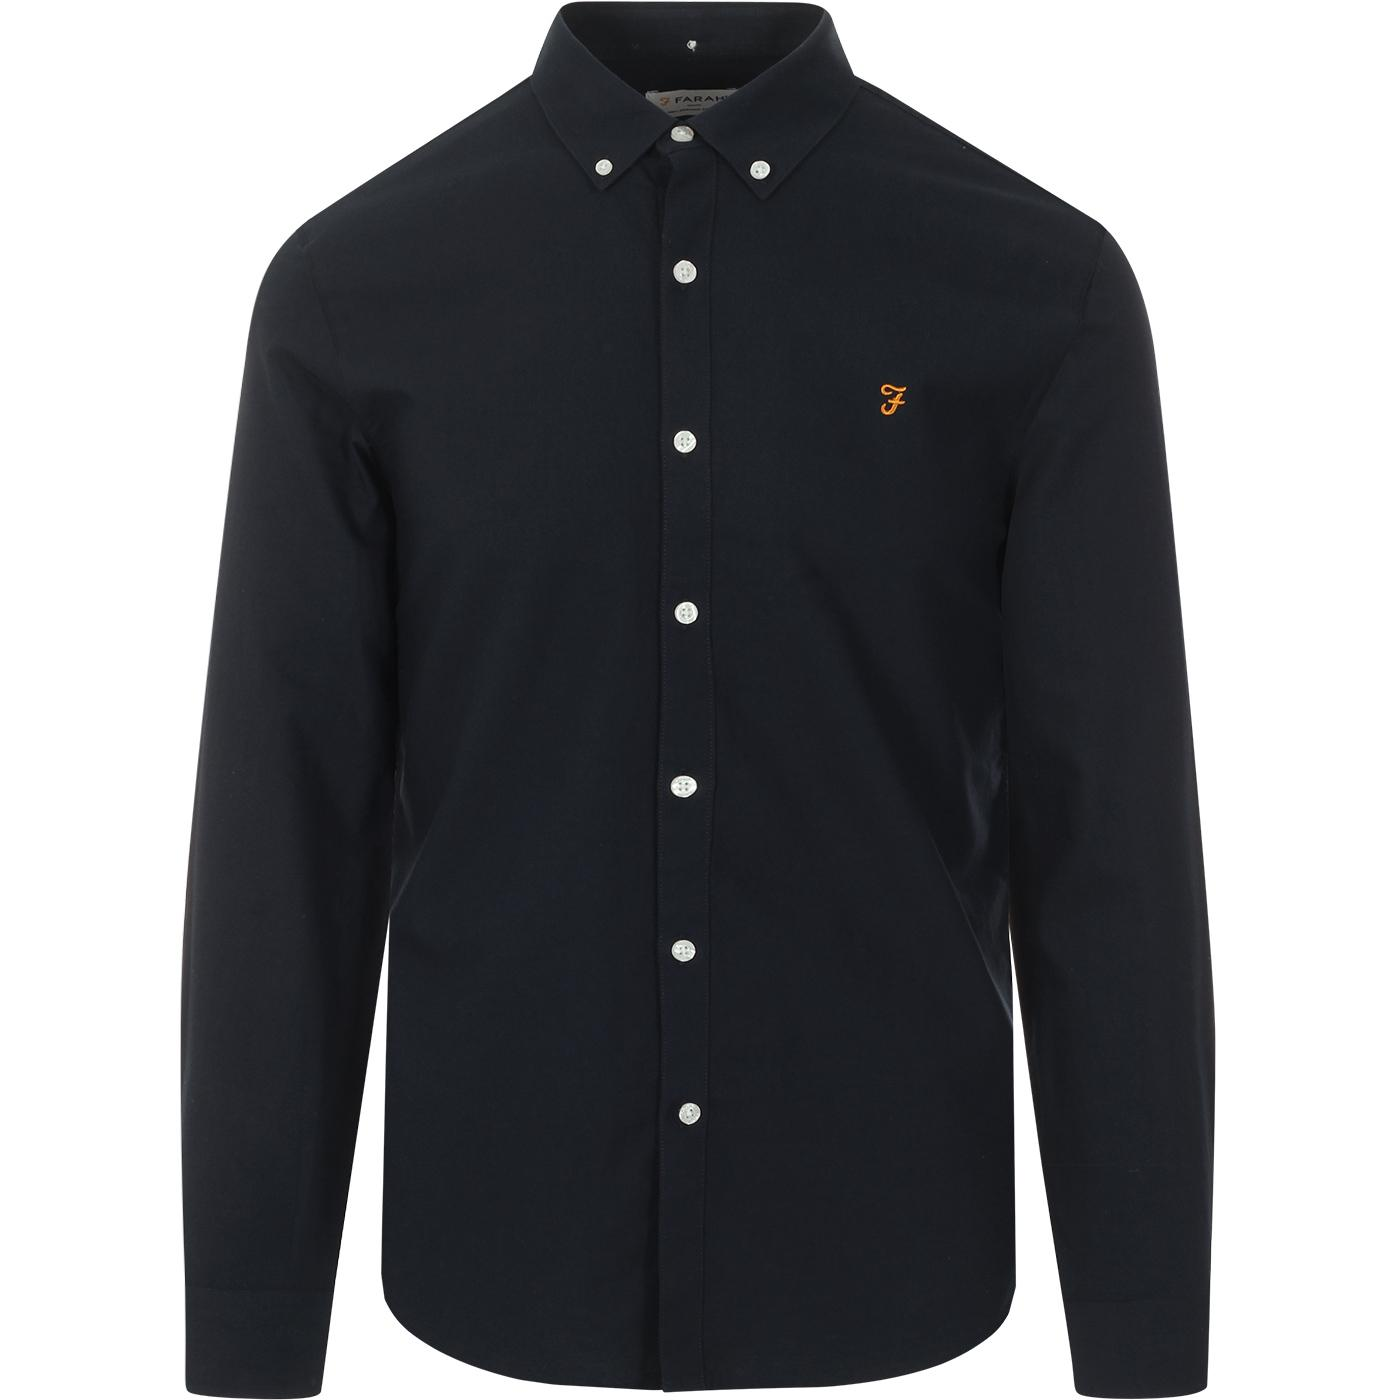 Brewer FARAH Slim Button Down Oxford Shirt (Navy)